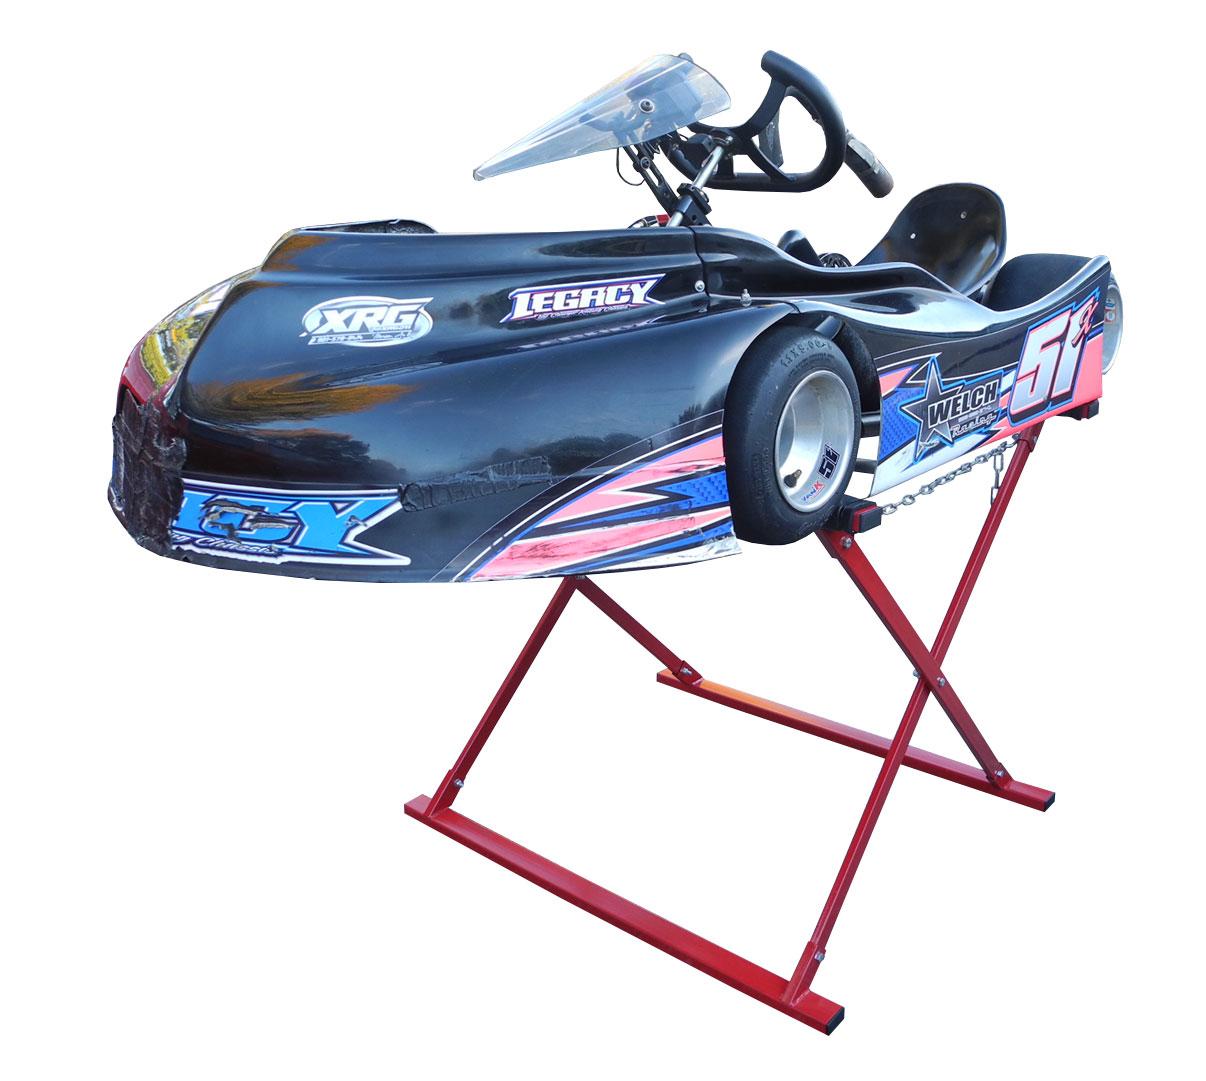 Redline Folding Go Kart Stand - CLEARANCE